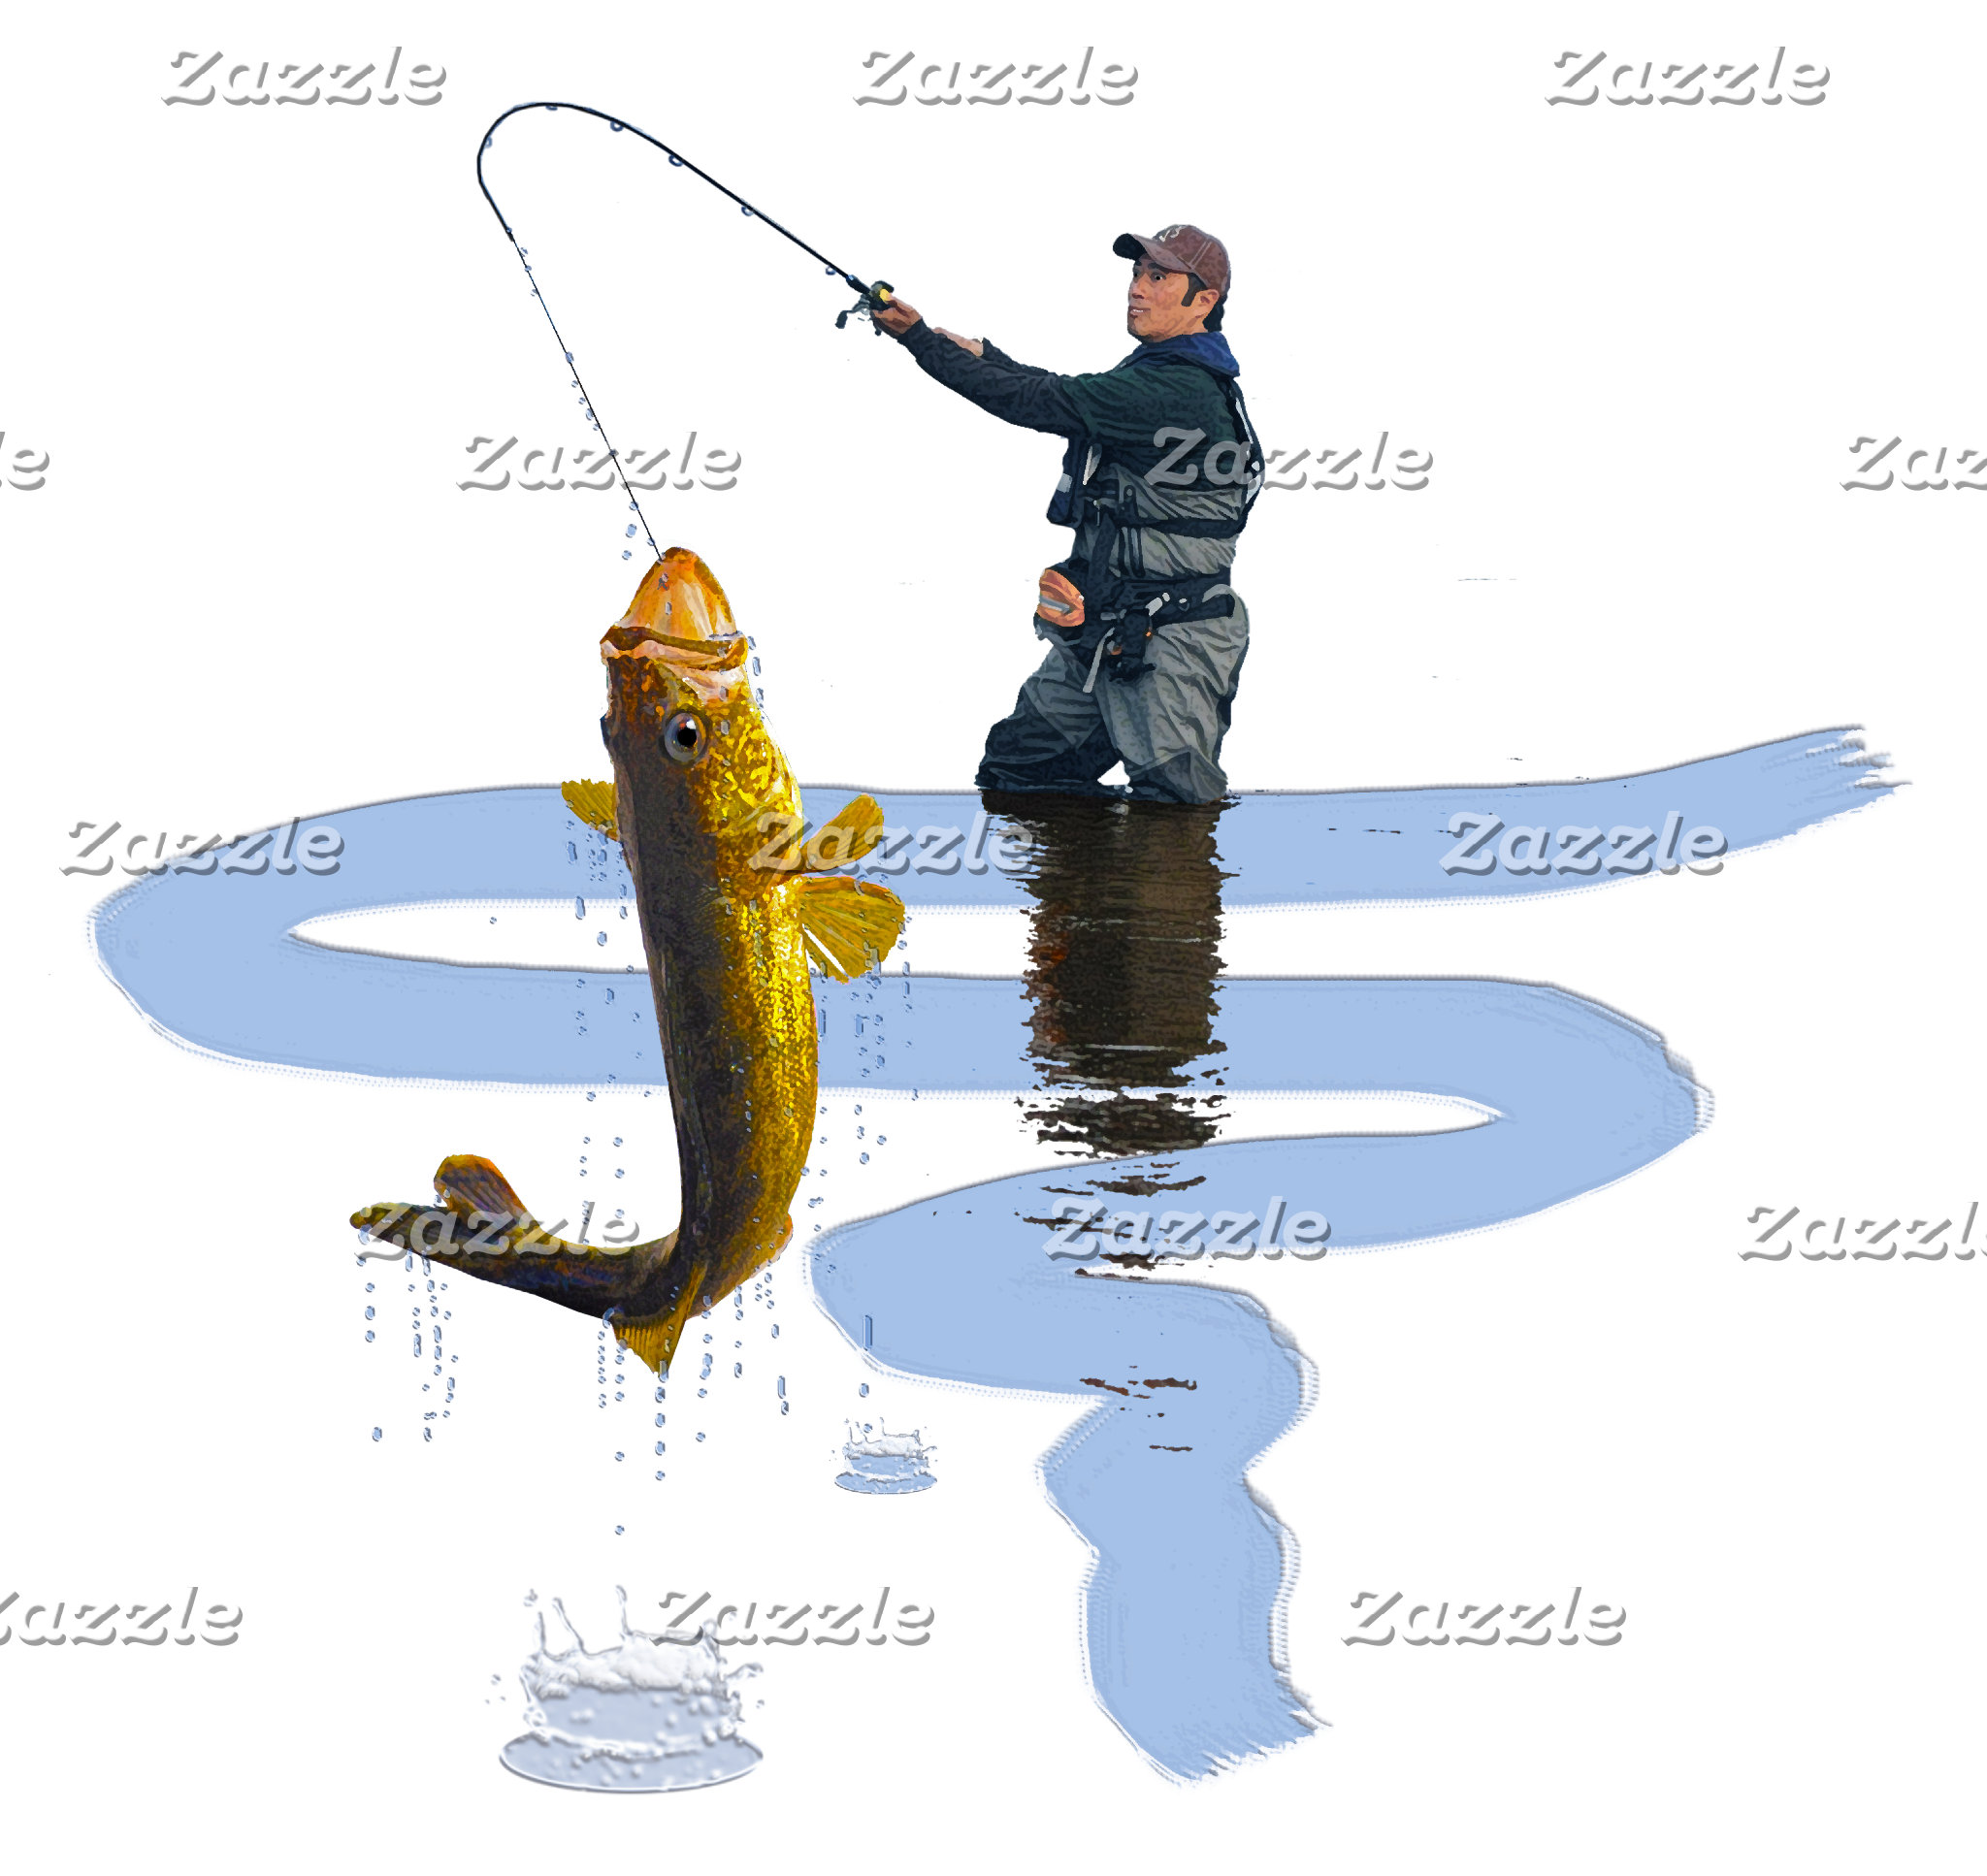 OUTDOOR SPORTS, FISHING, SKIING etc.